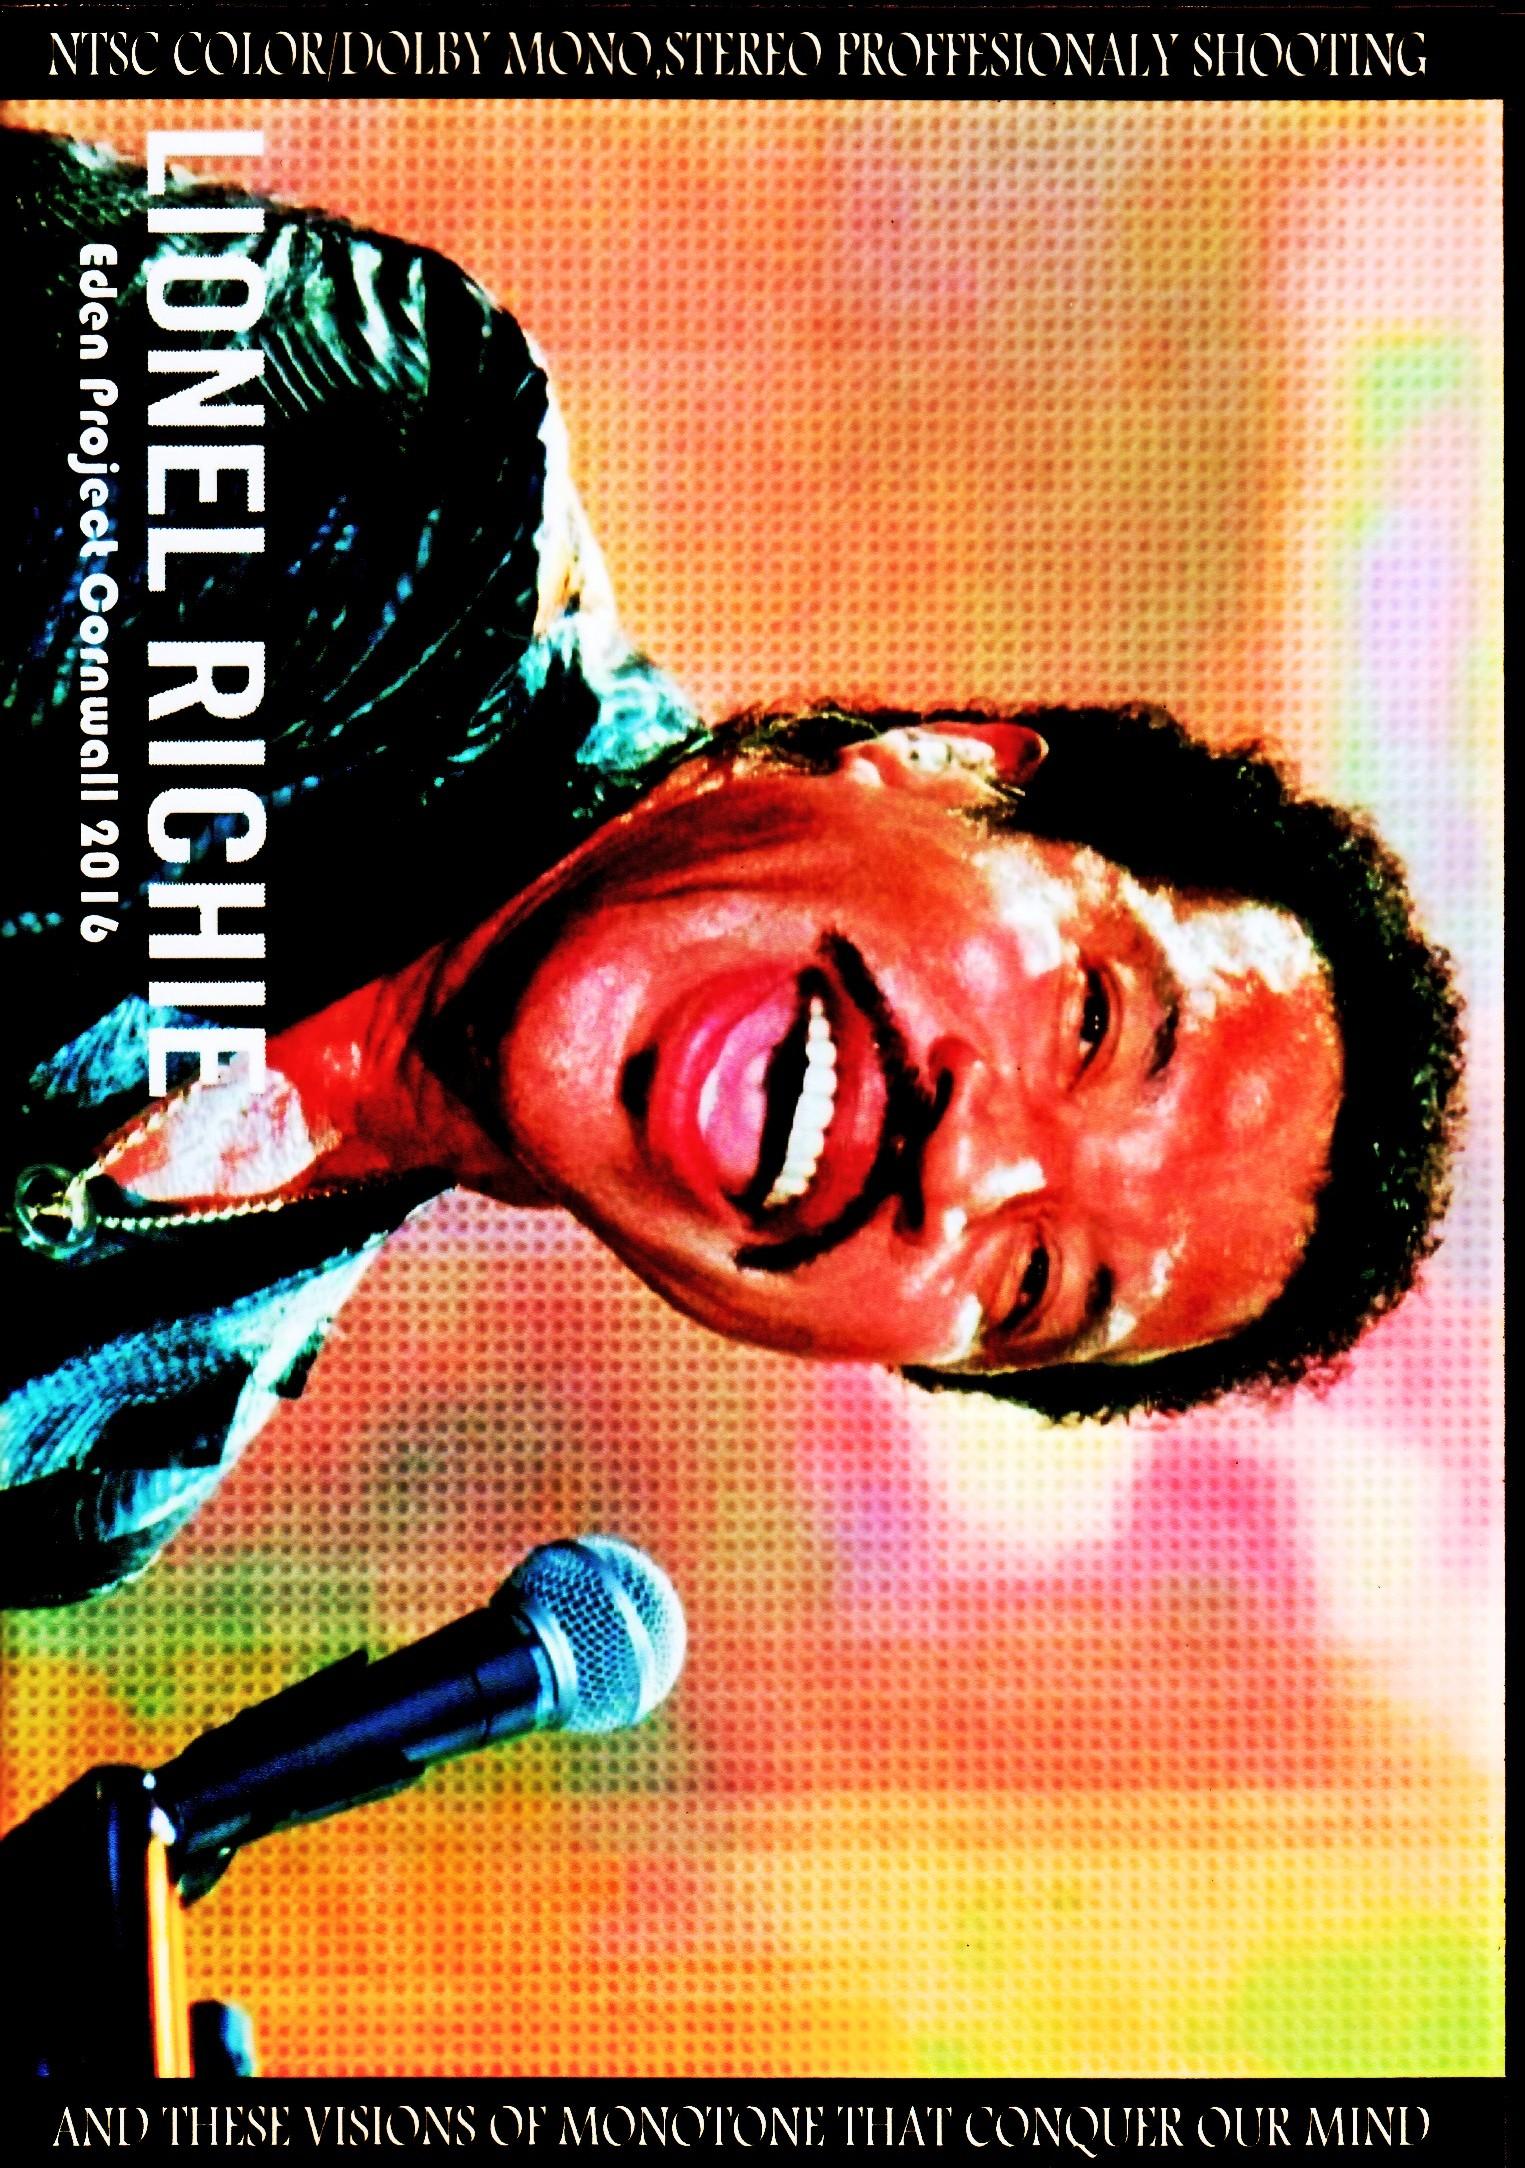 Lionel Richie ライオネル・リッチー/UK 2016